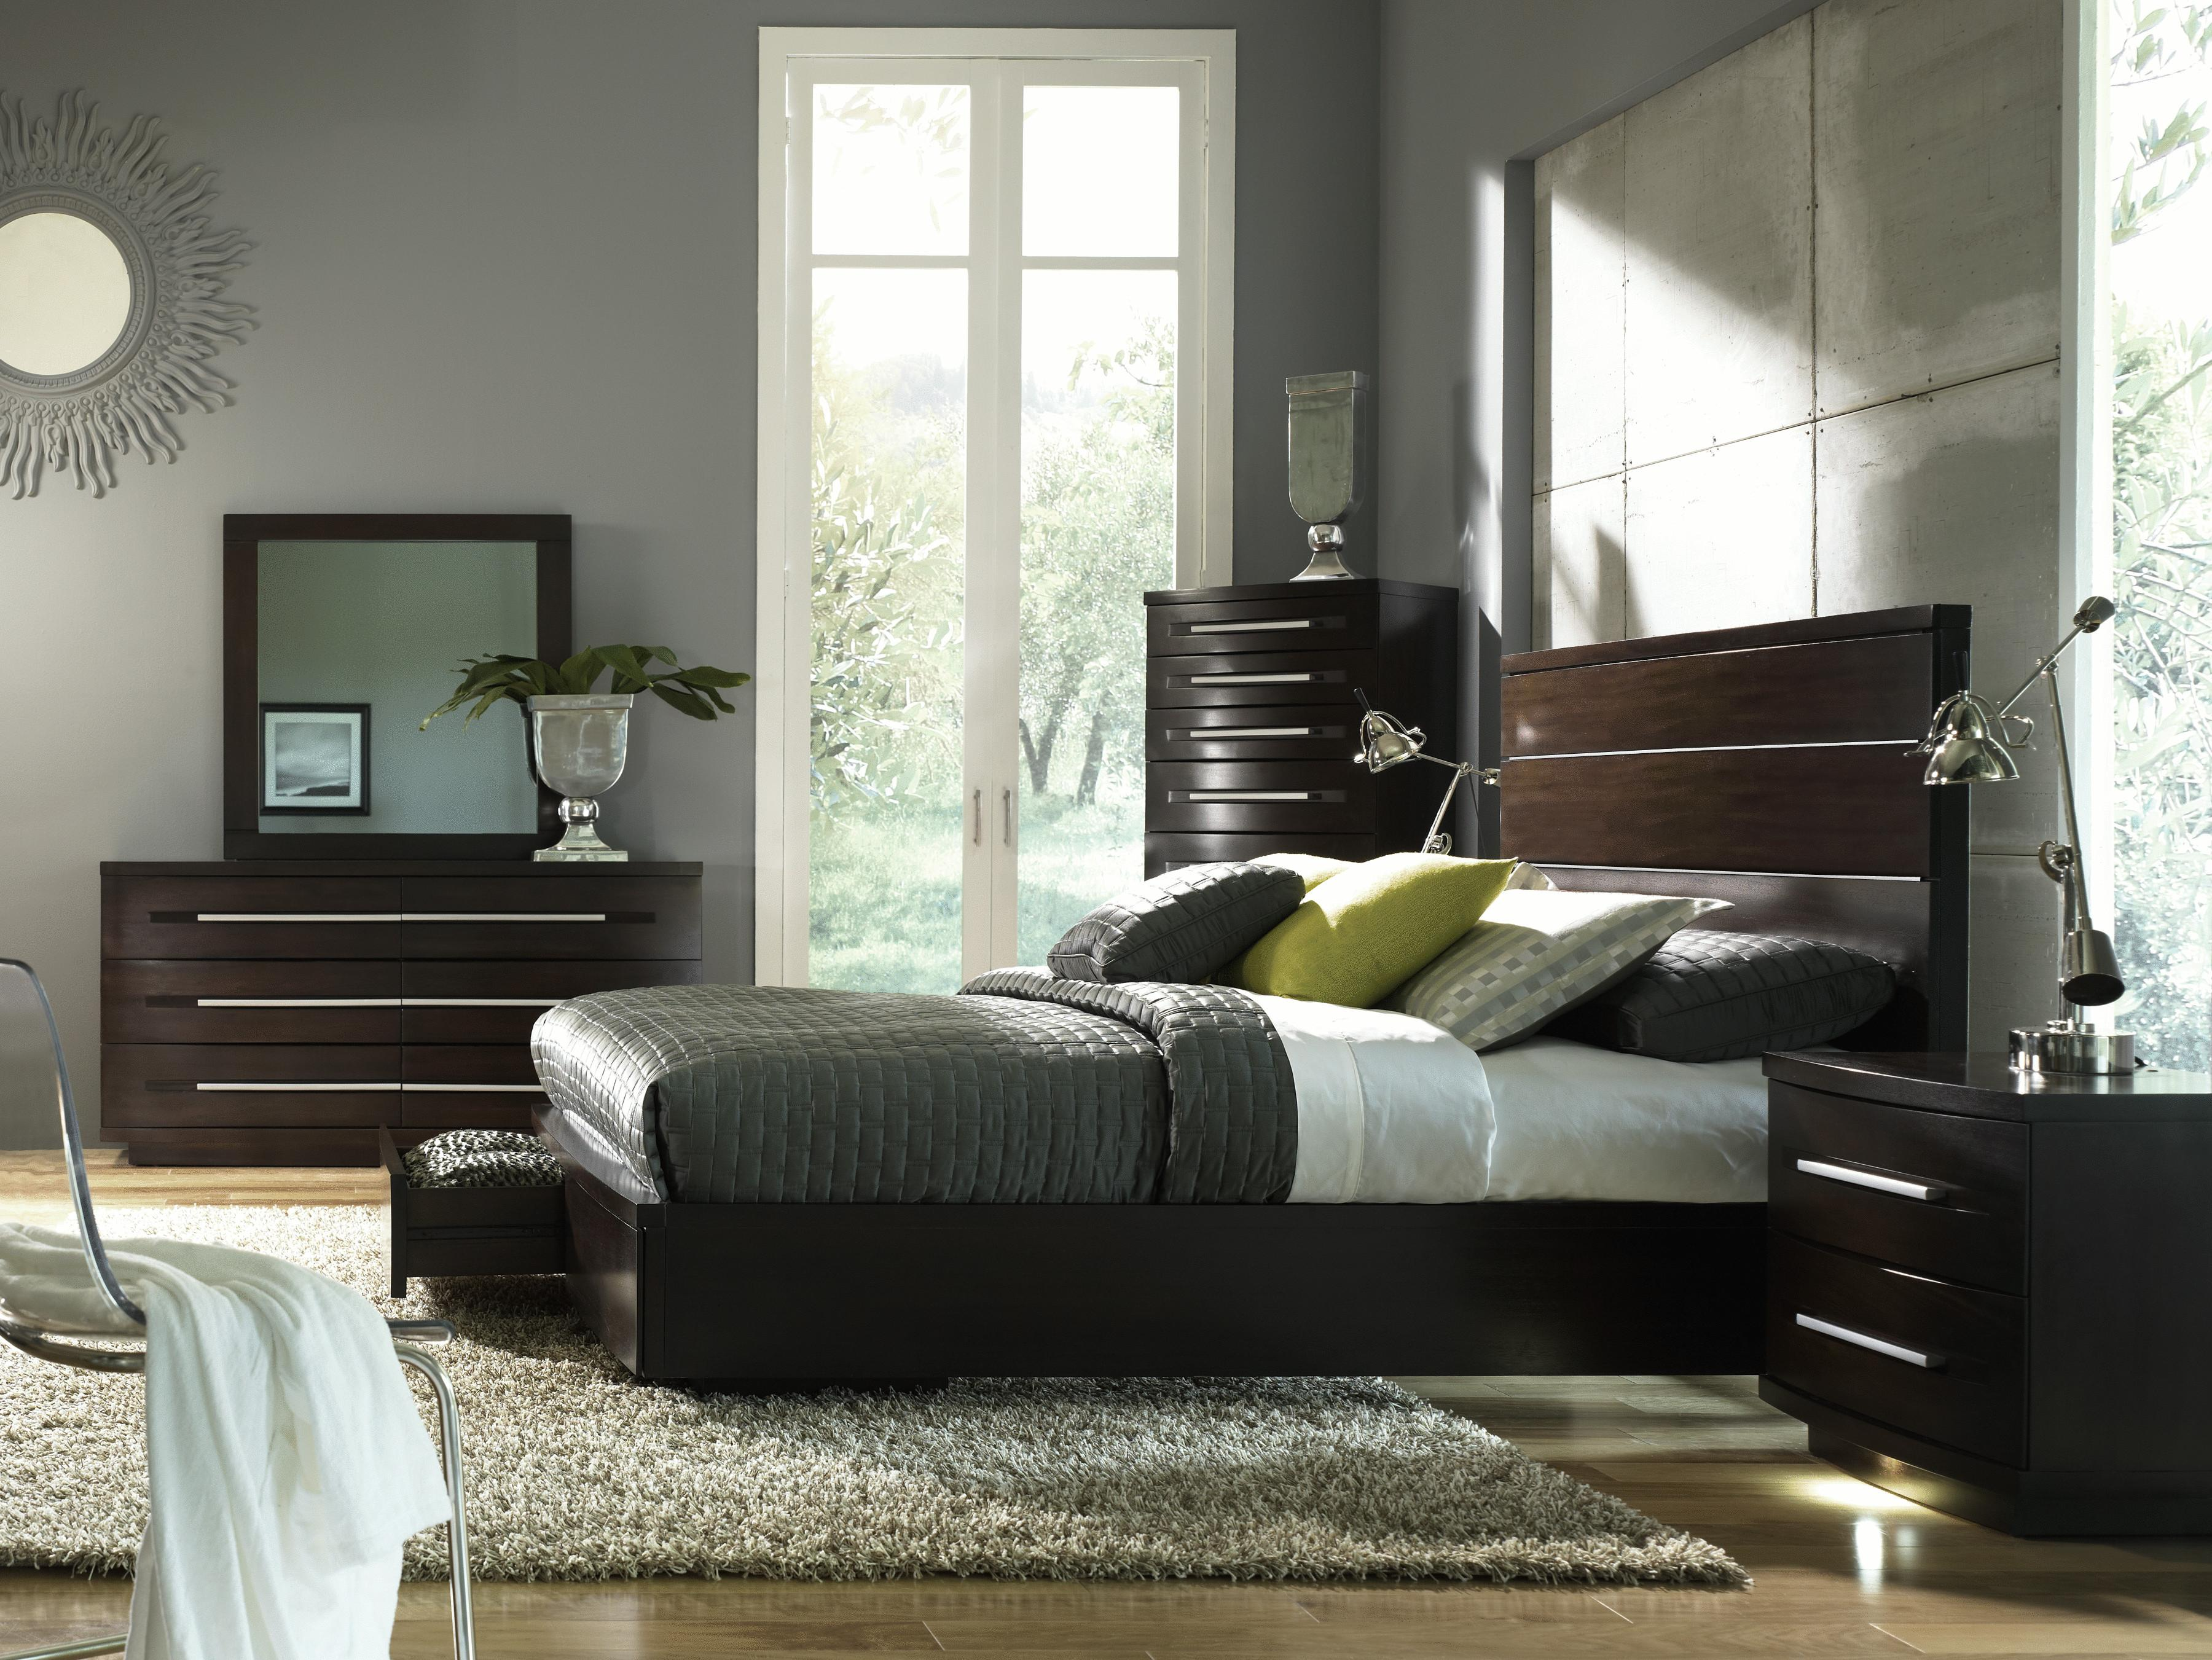 Marbella Bedroom Furniture Espresso Bedroom Set Art Van Furniture Bedroom Sets Bedroom Sets